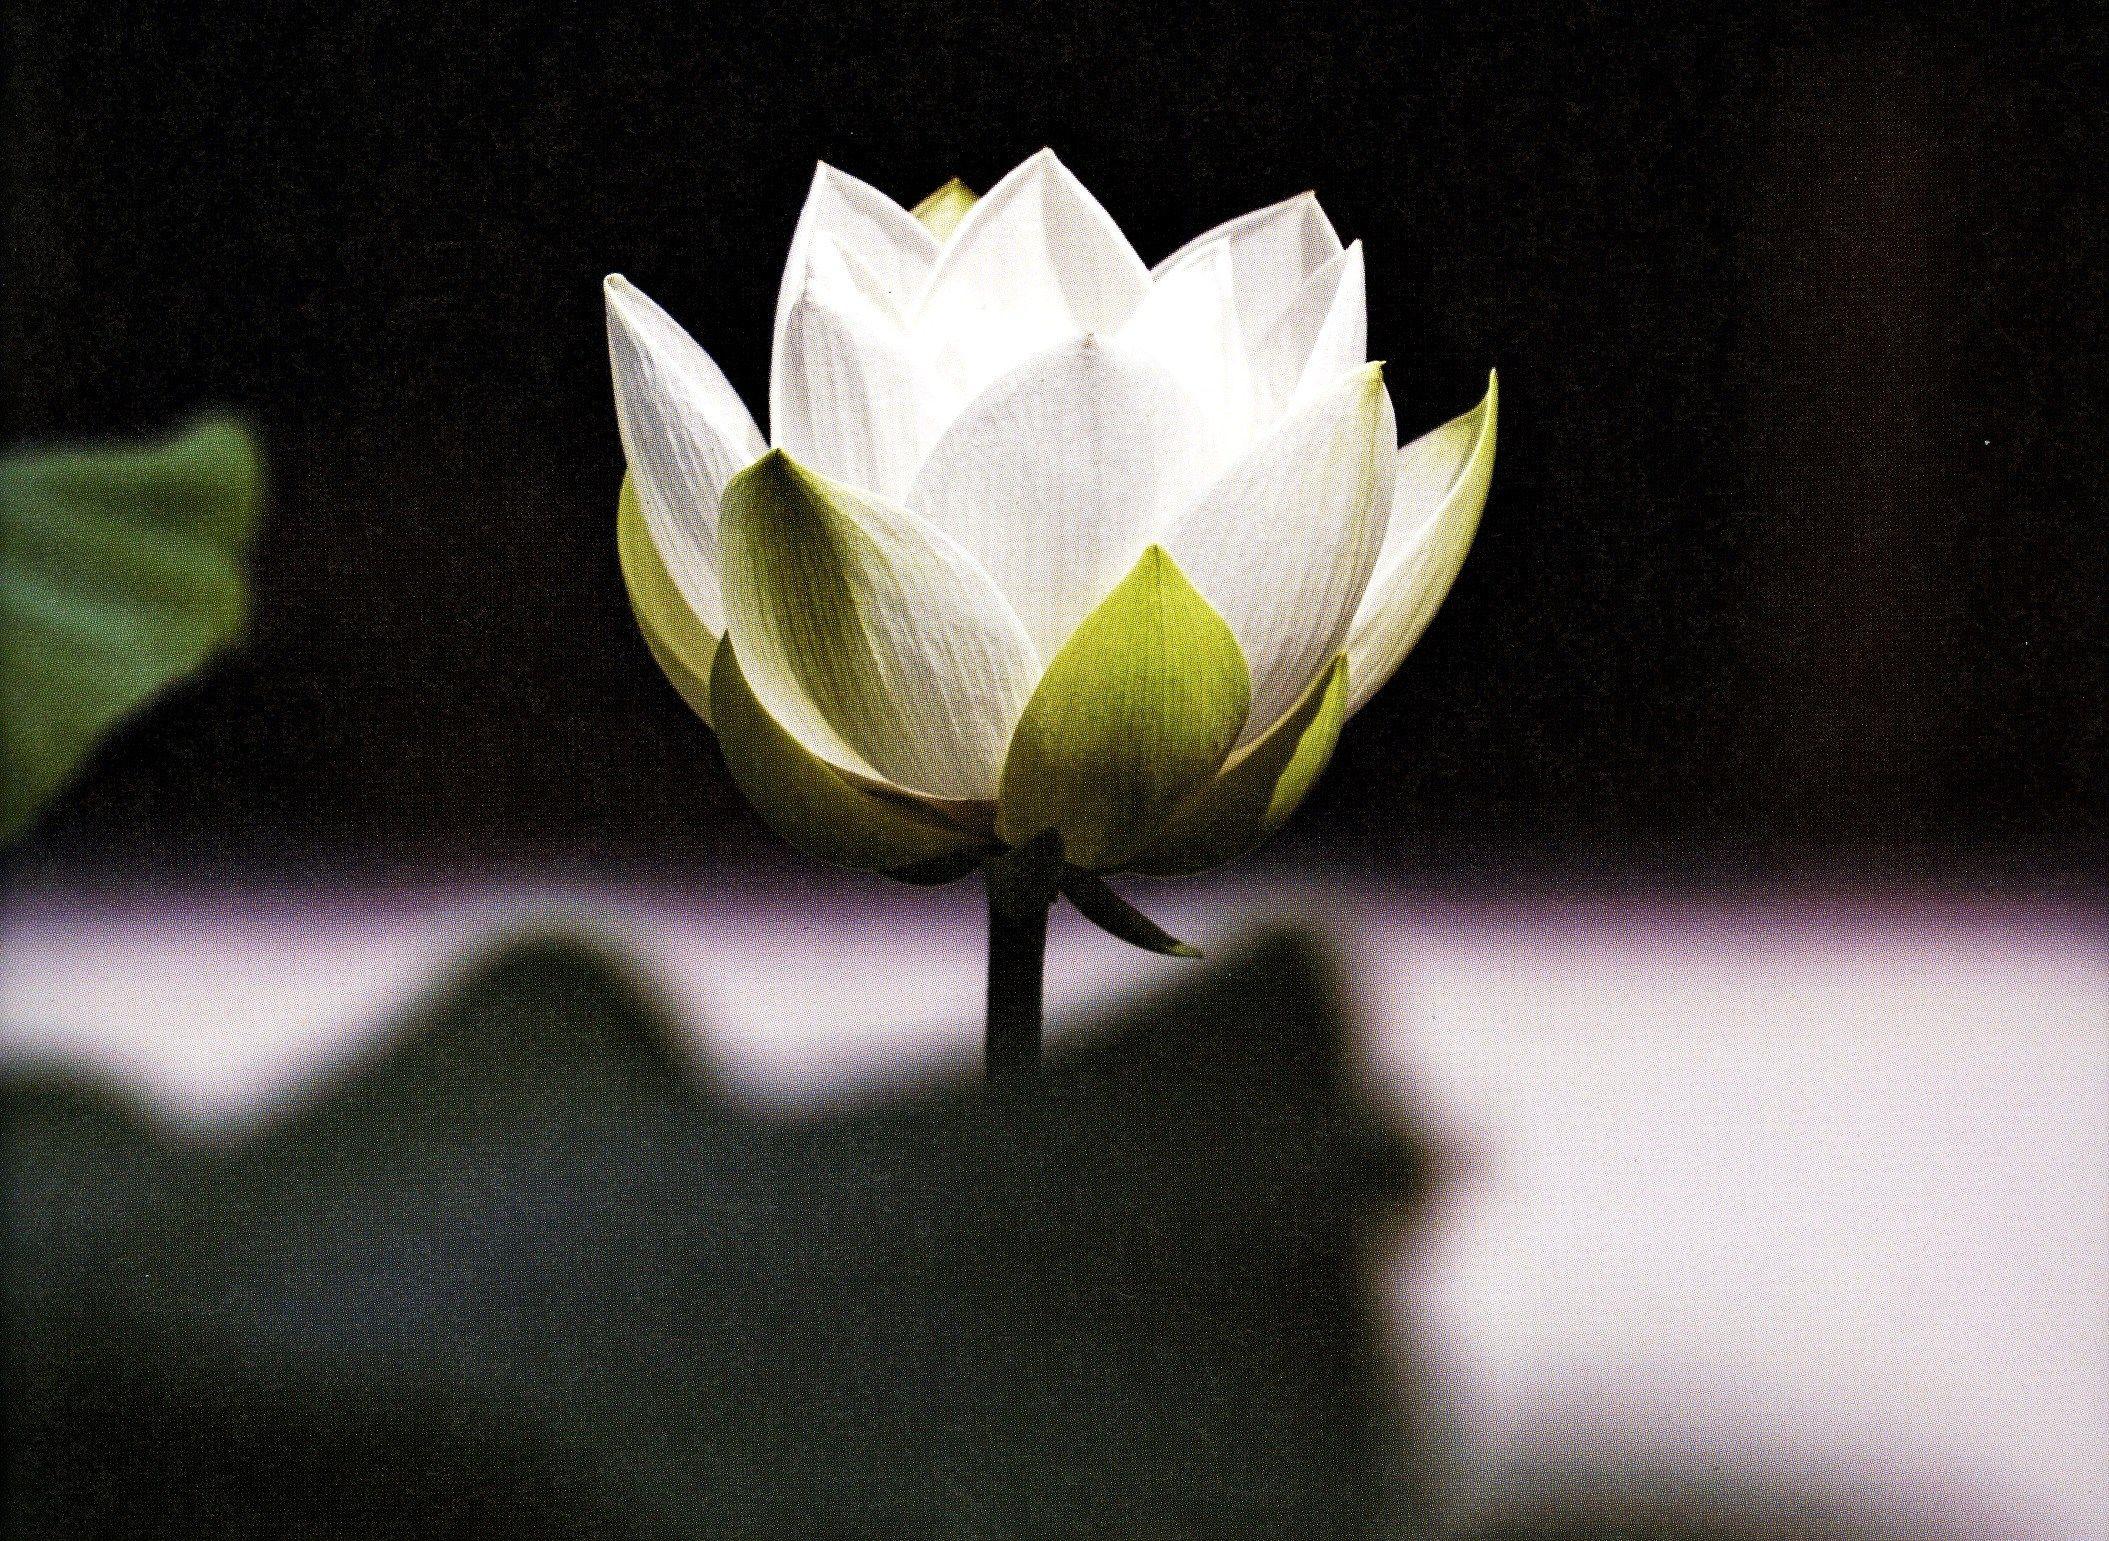 , (22) Lotus Buddha Meaning – Sensational Image, My Tattoo Blog 2020, My Tattoo Blog 2020